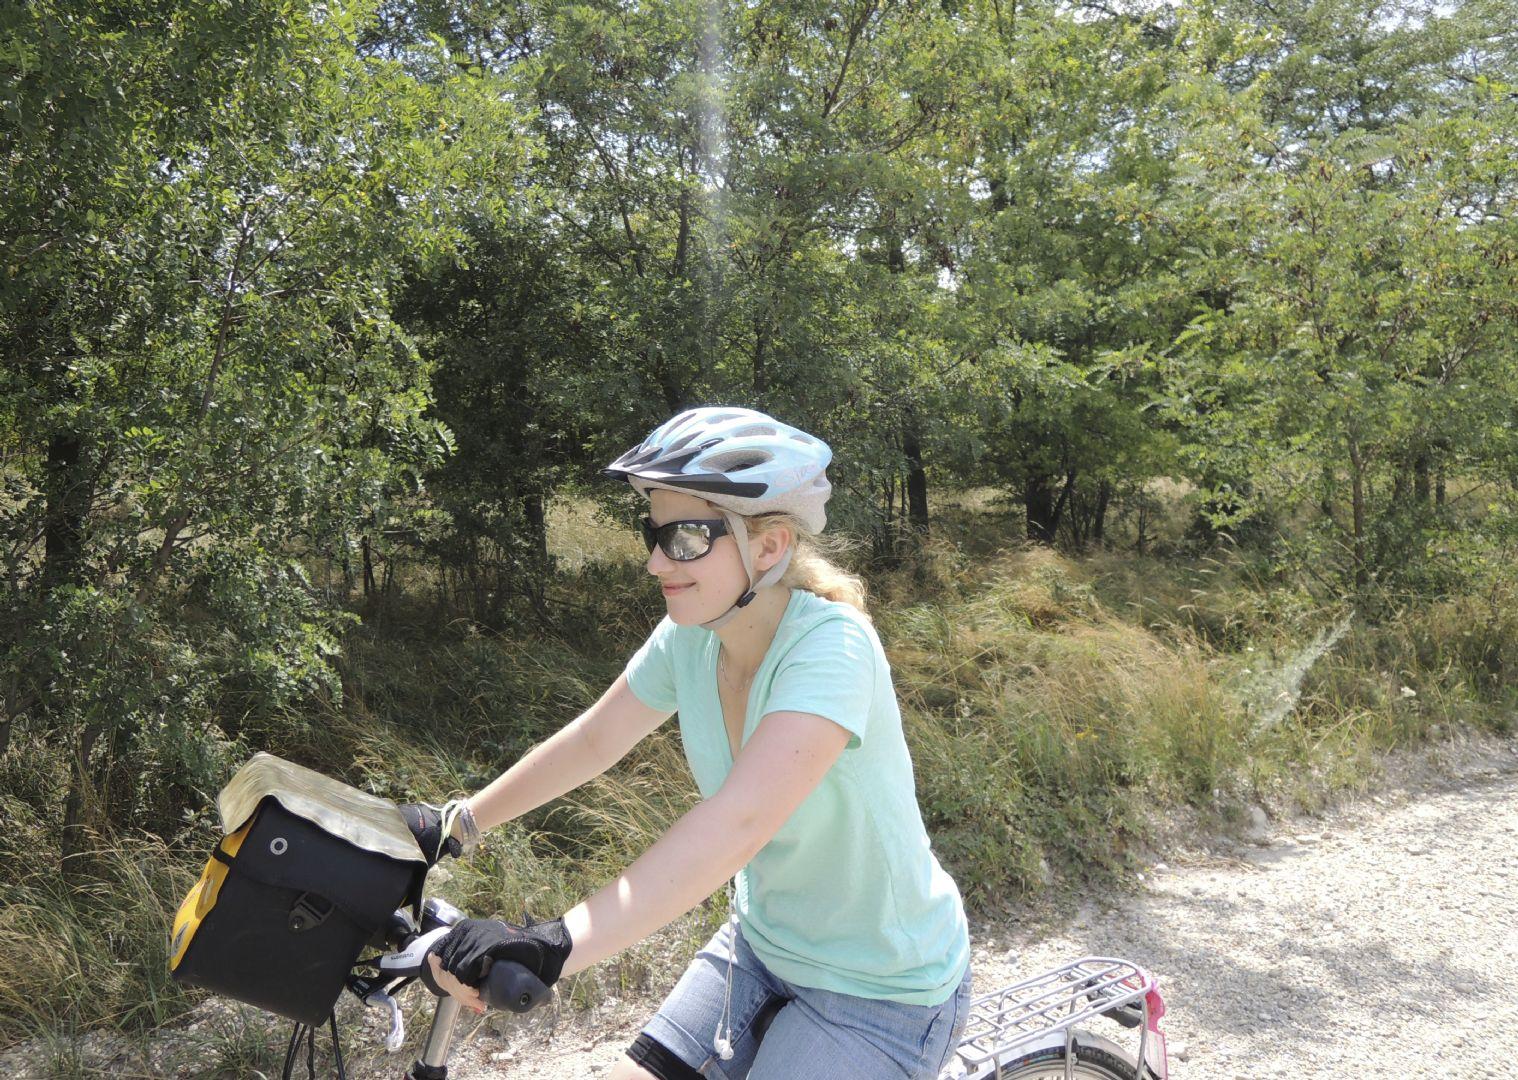 viennatobudapest5.jpg - Austria, Slovakia and Hungary - Vienna to Budapest - Self-Guided Family Cycling Holiday - Family Cycling